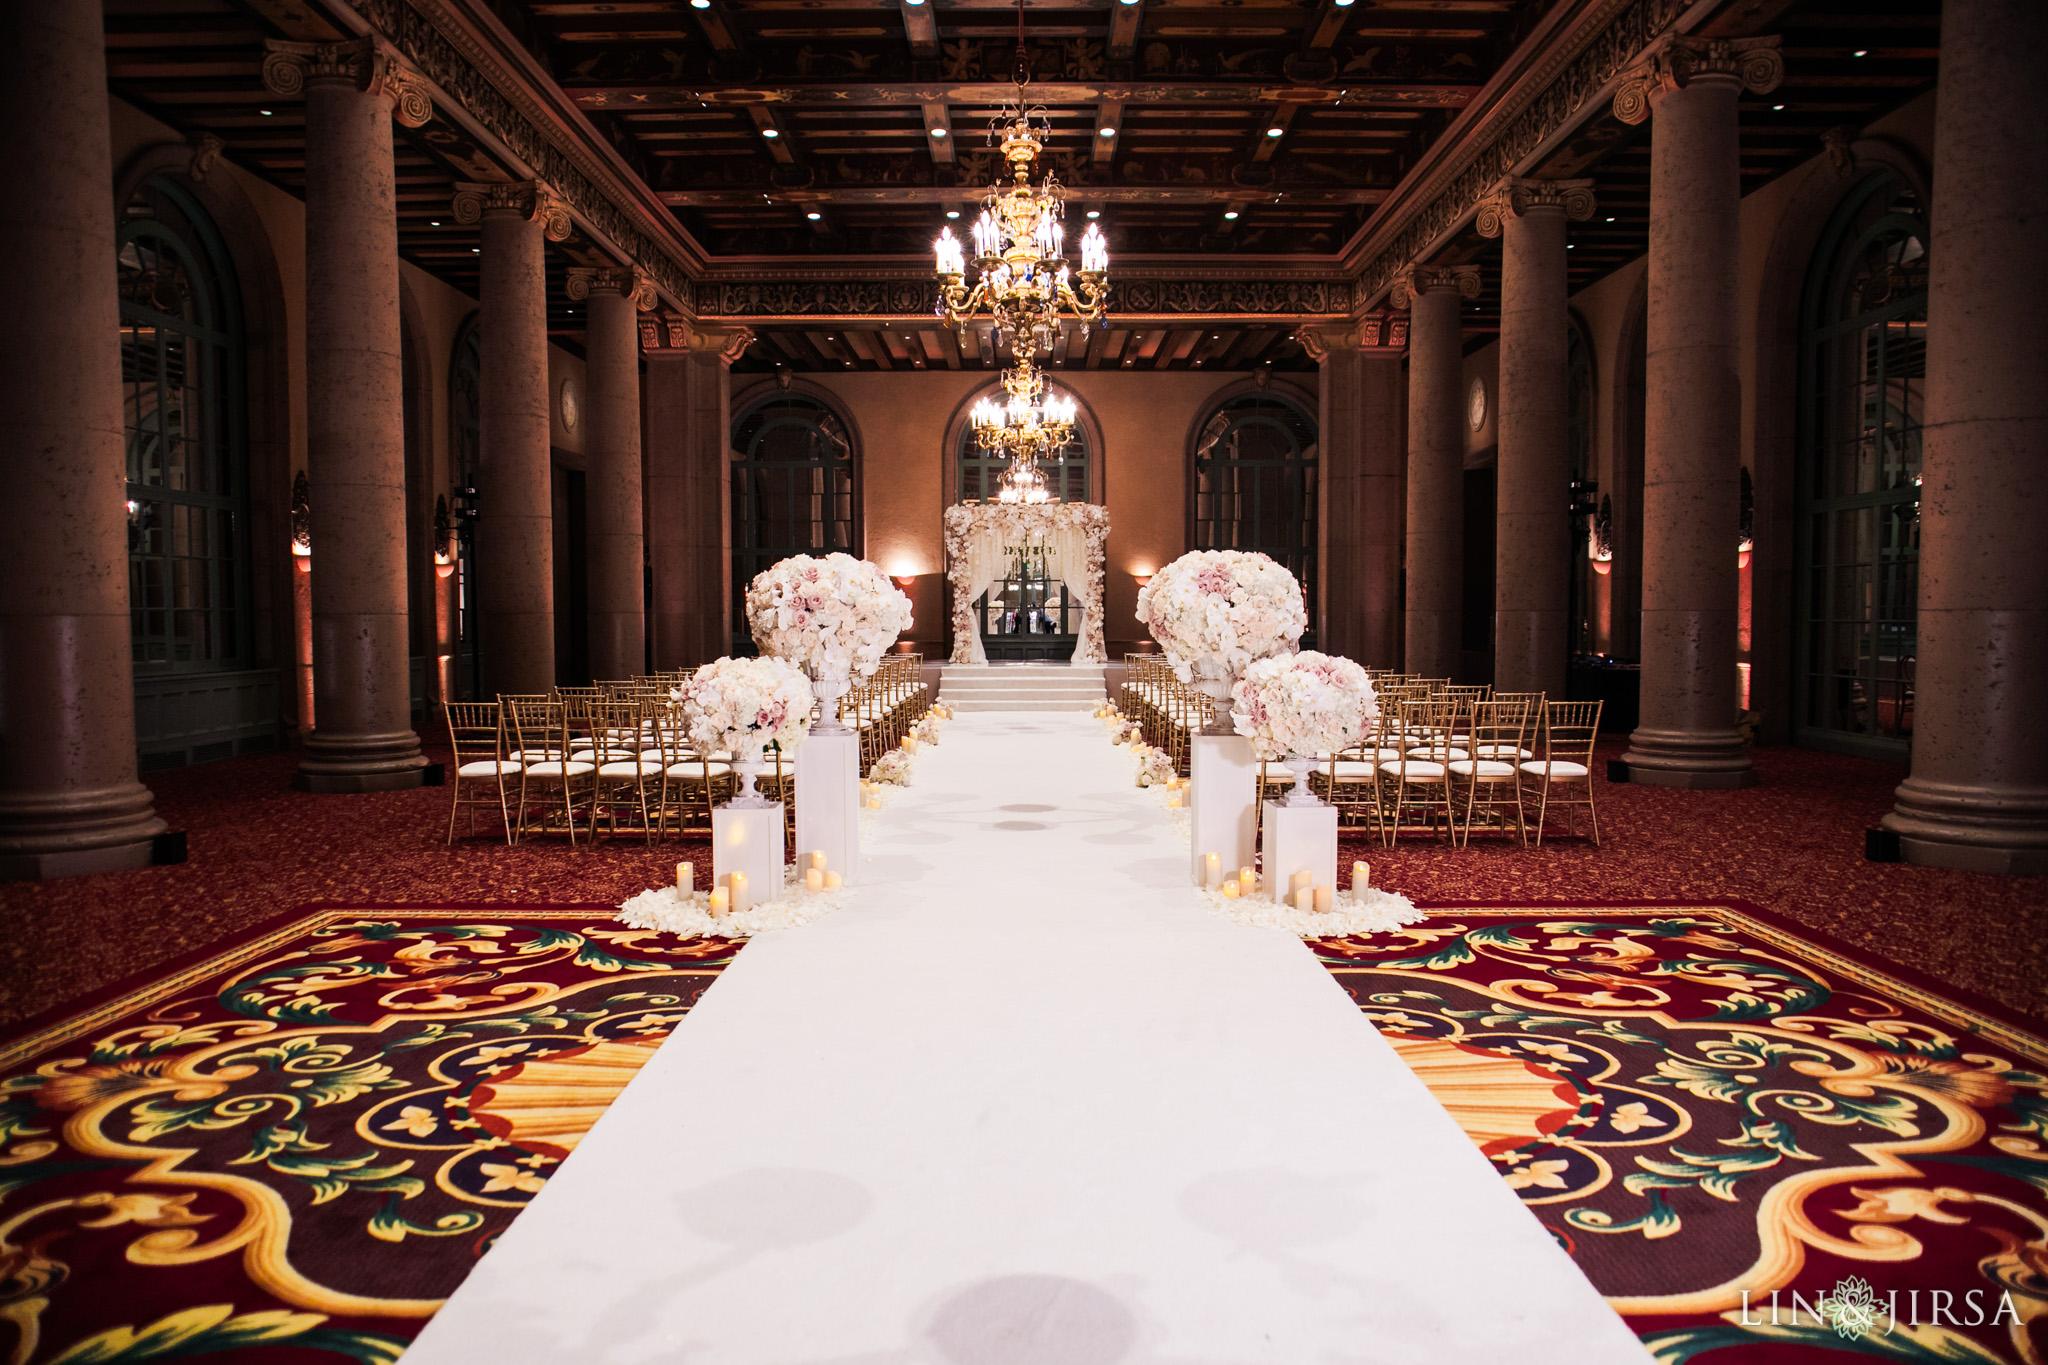 009 millennium biltmore hotel los angeles wedding photography